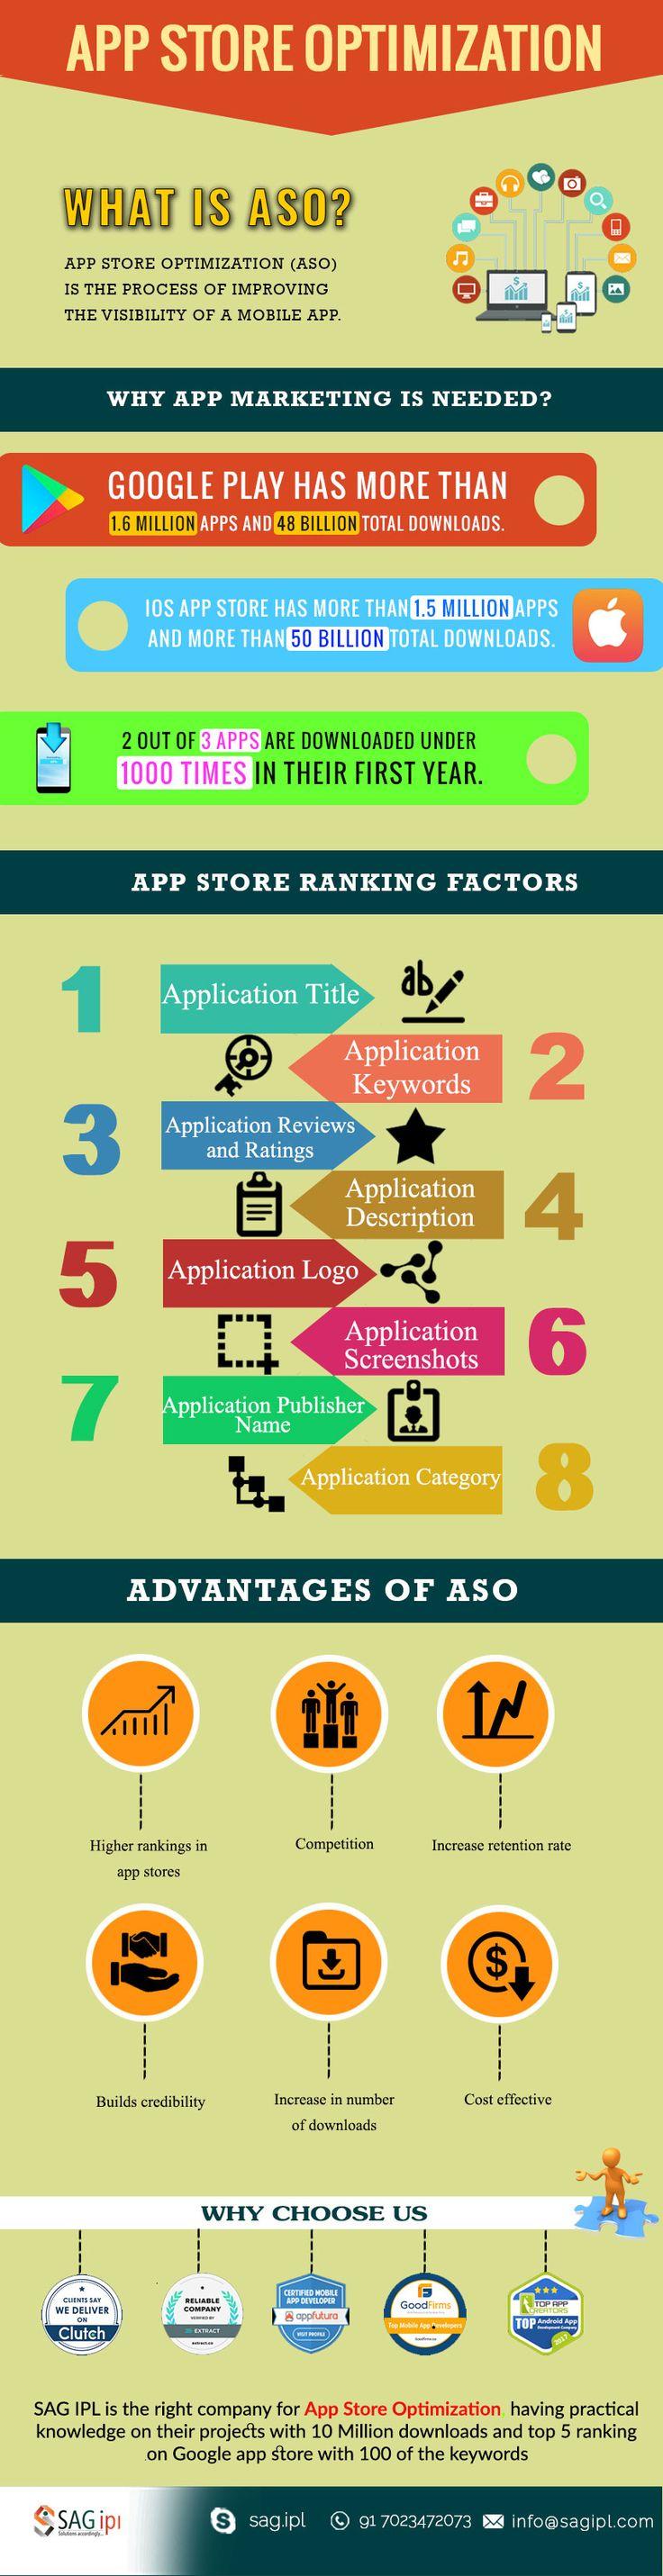 App Store Optimization (ASO) - Infographic